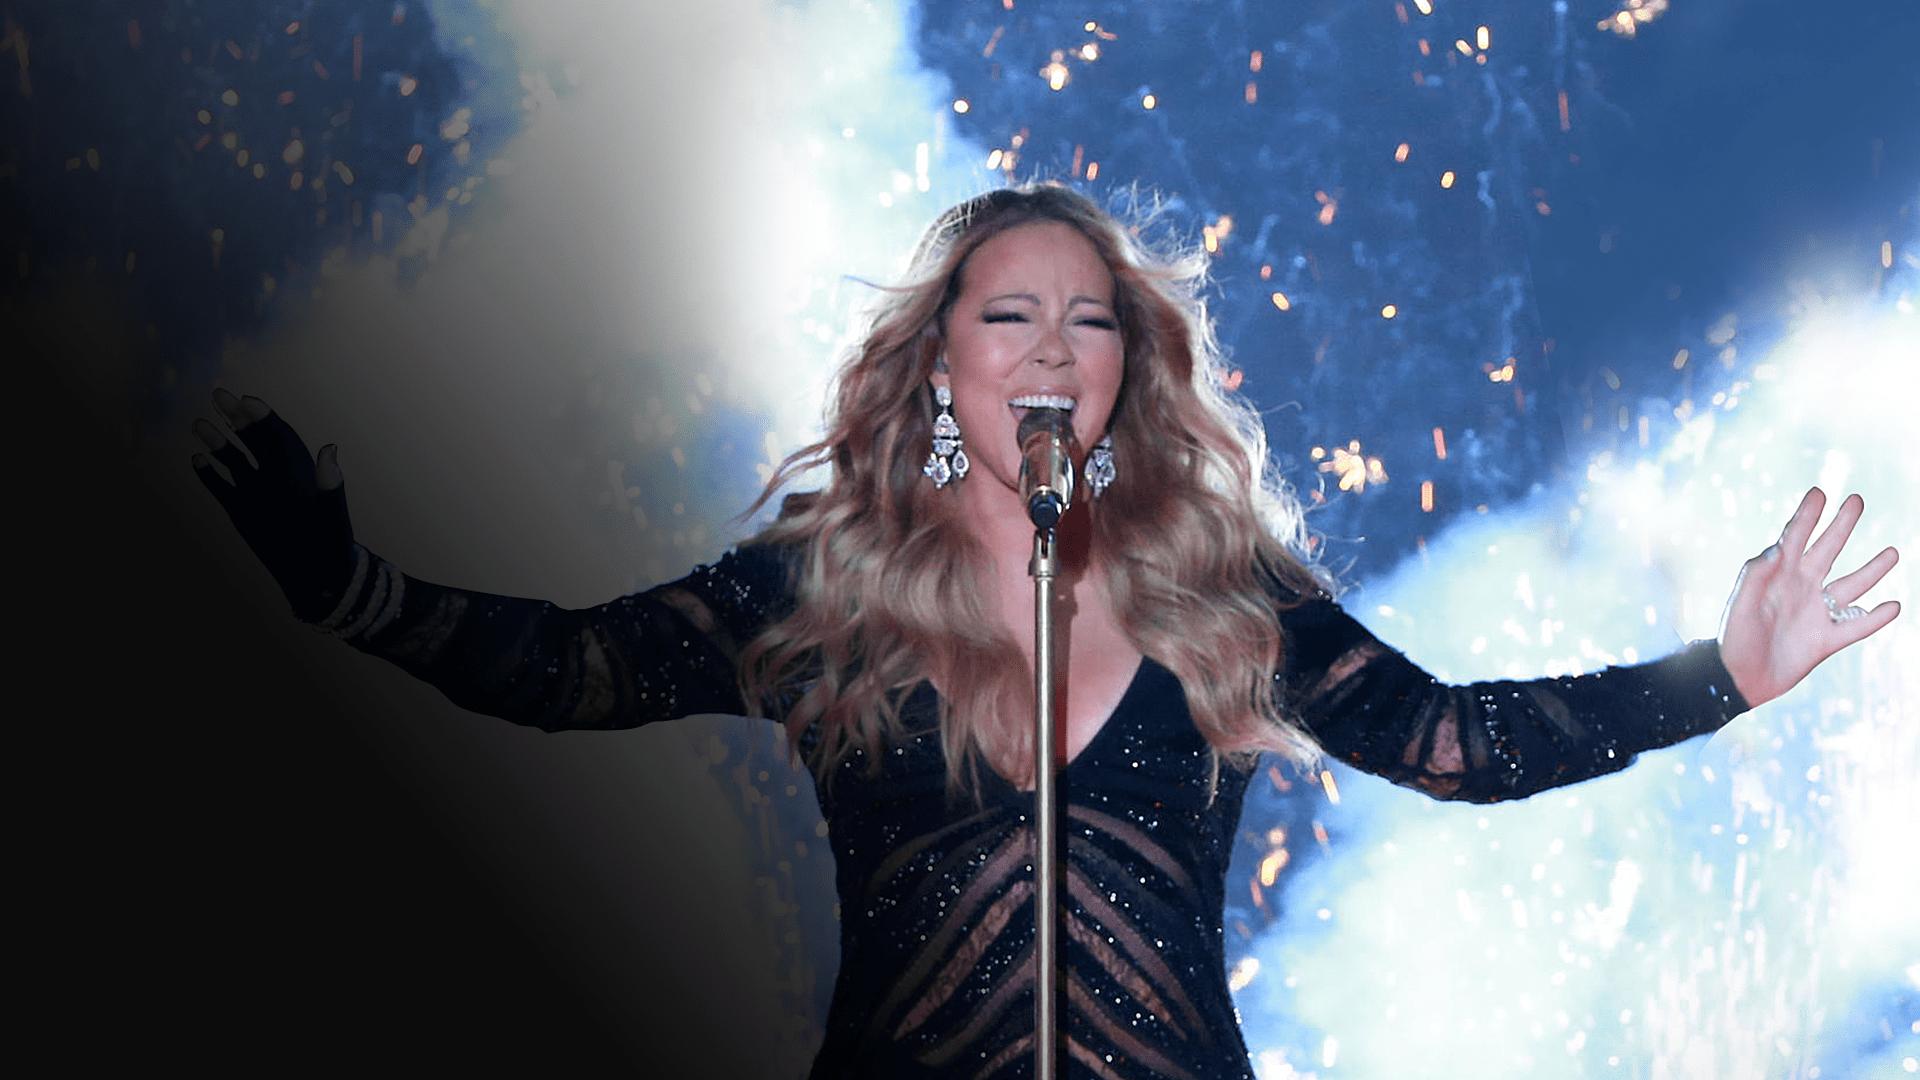 Mariah Carey Performs  At The World Music Awards